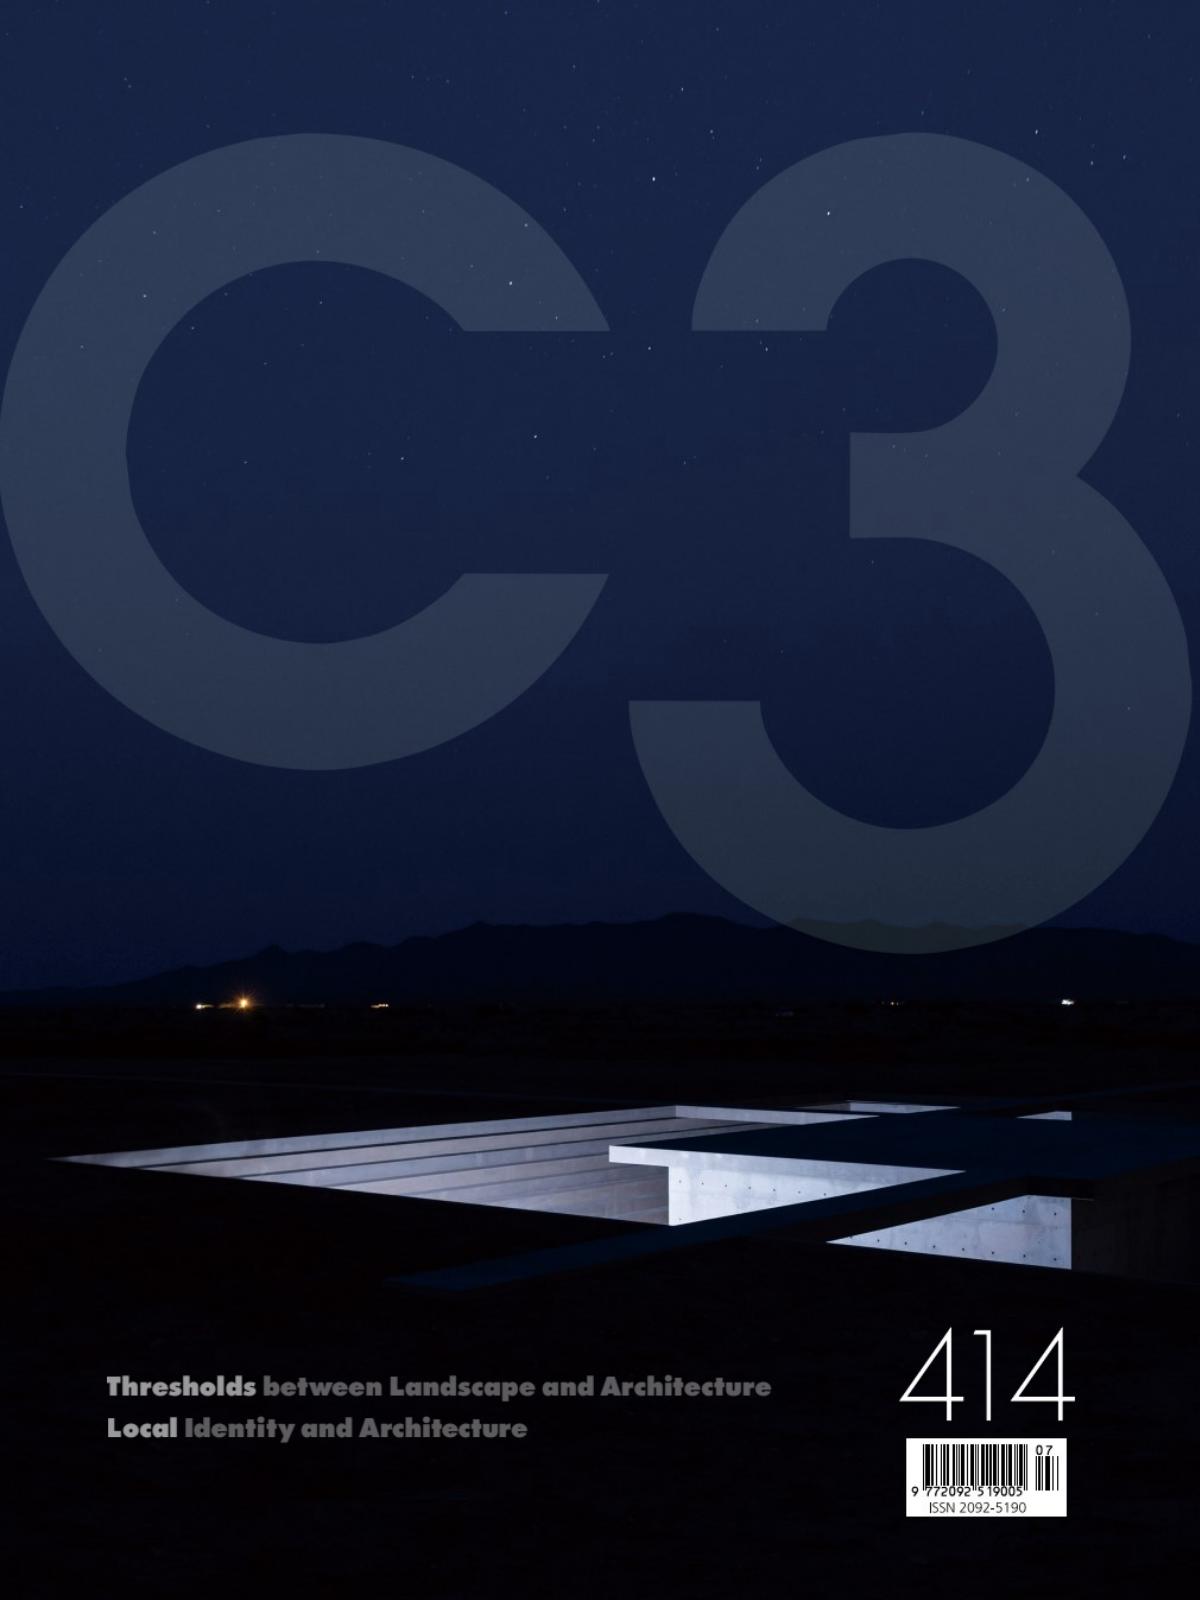 Publication in C3